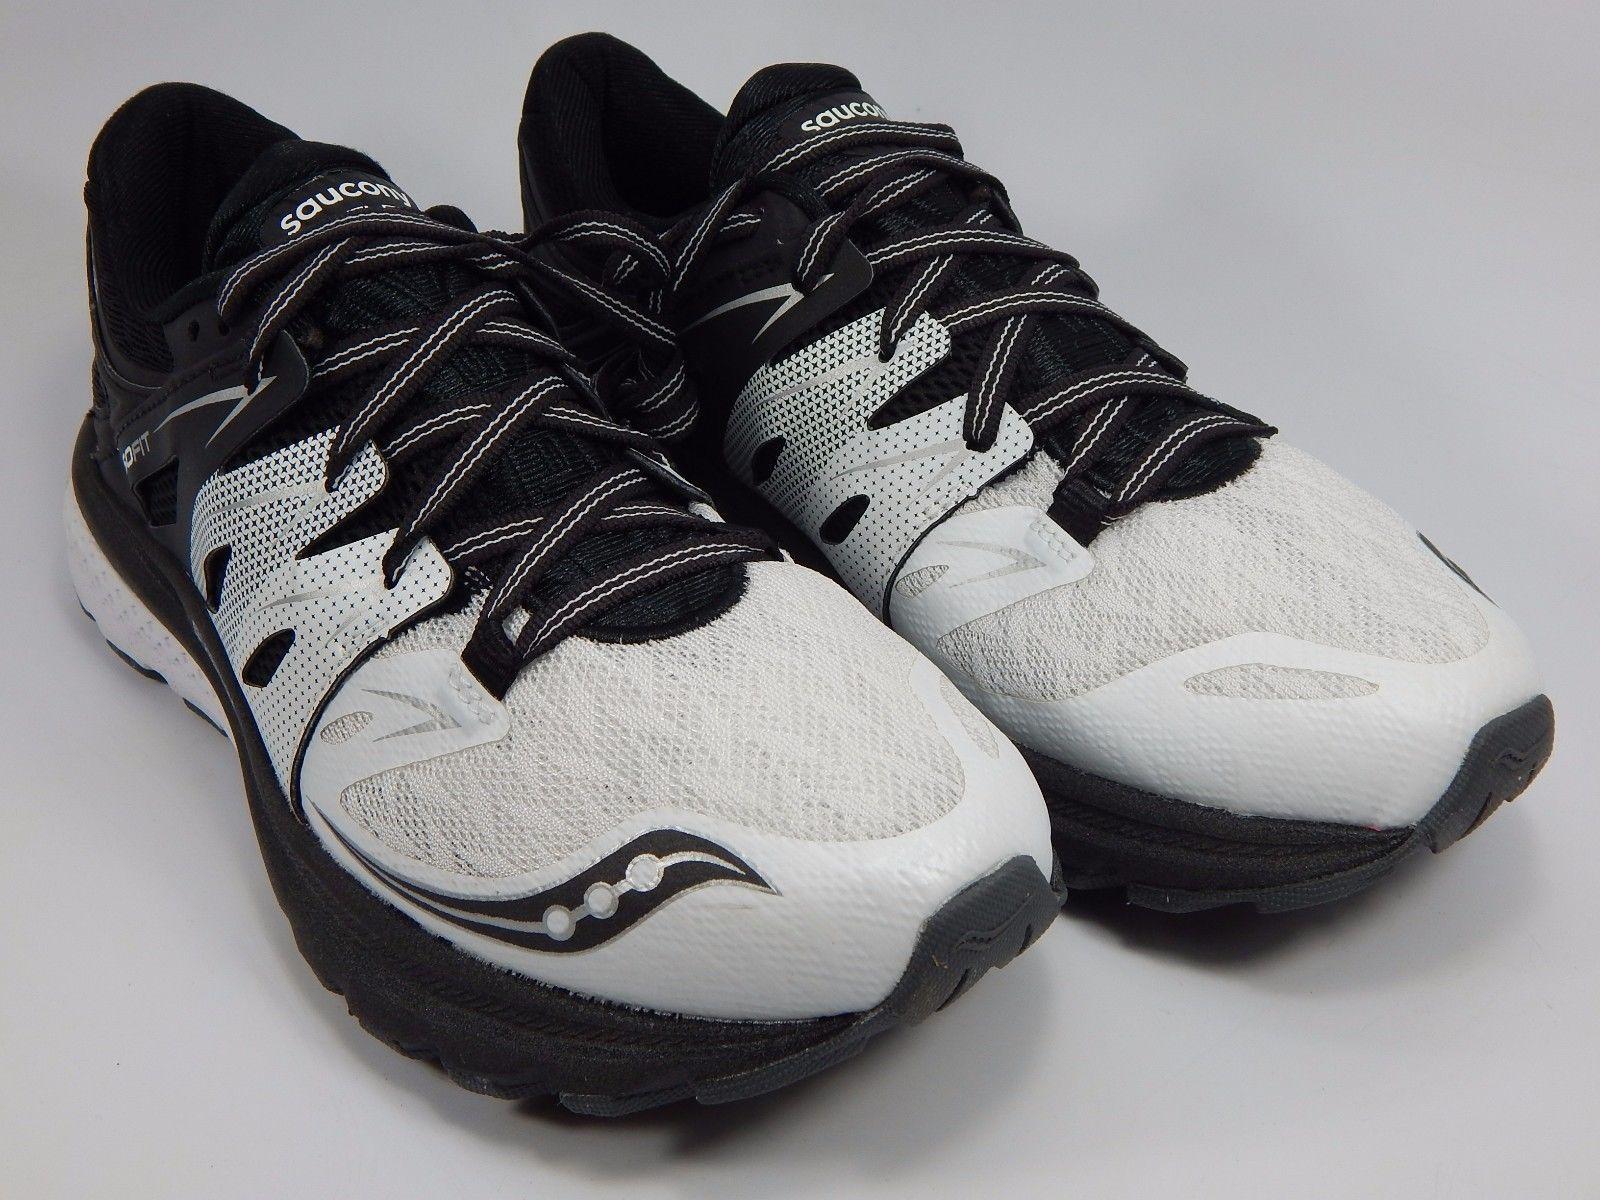 Saucony Zealot ISO 2 Women's Running Shoes Size US 8 M (B) EU 39 White S10332-1